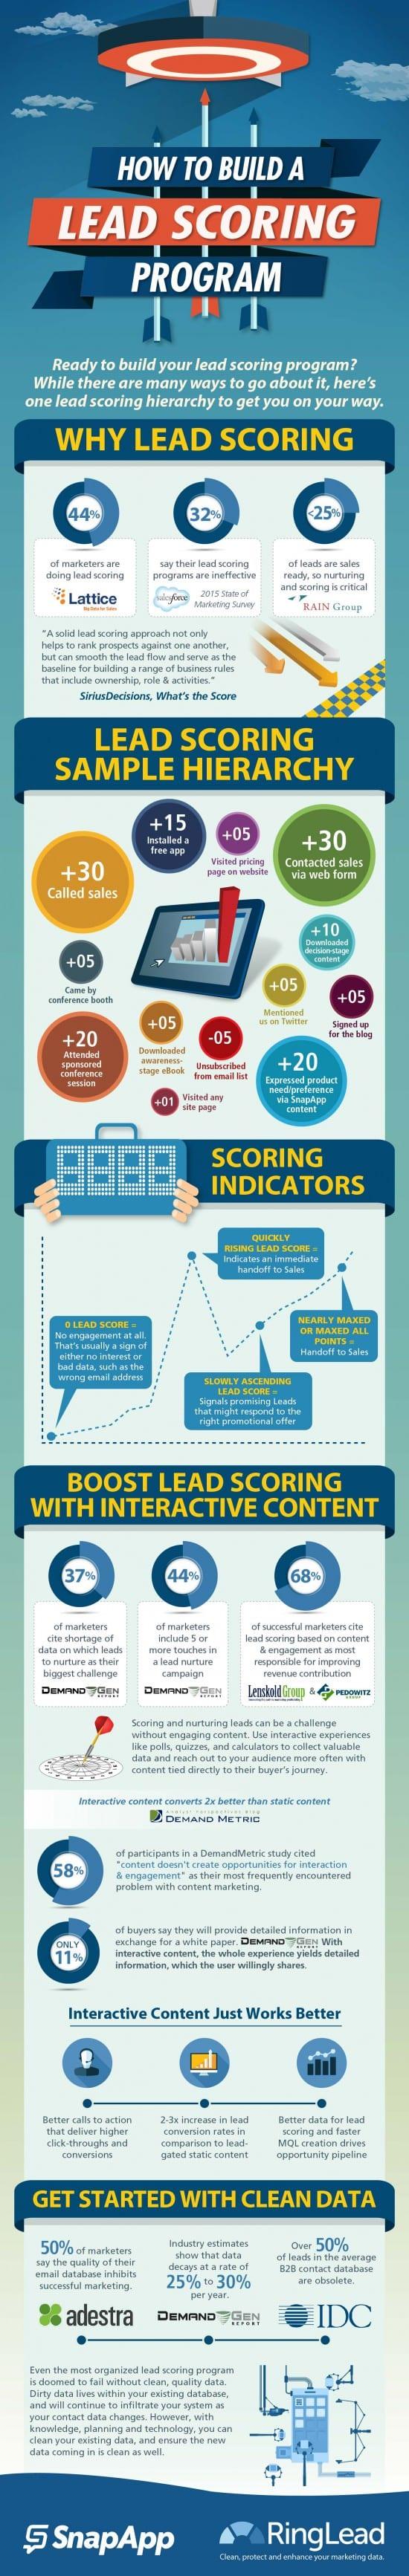 leads score program infographic